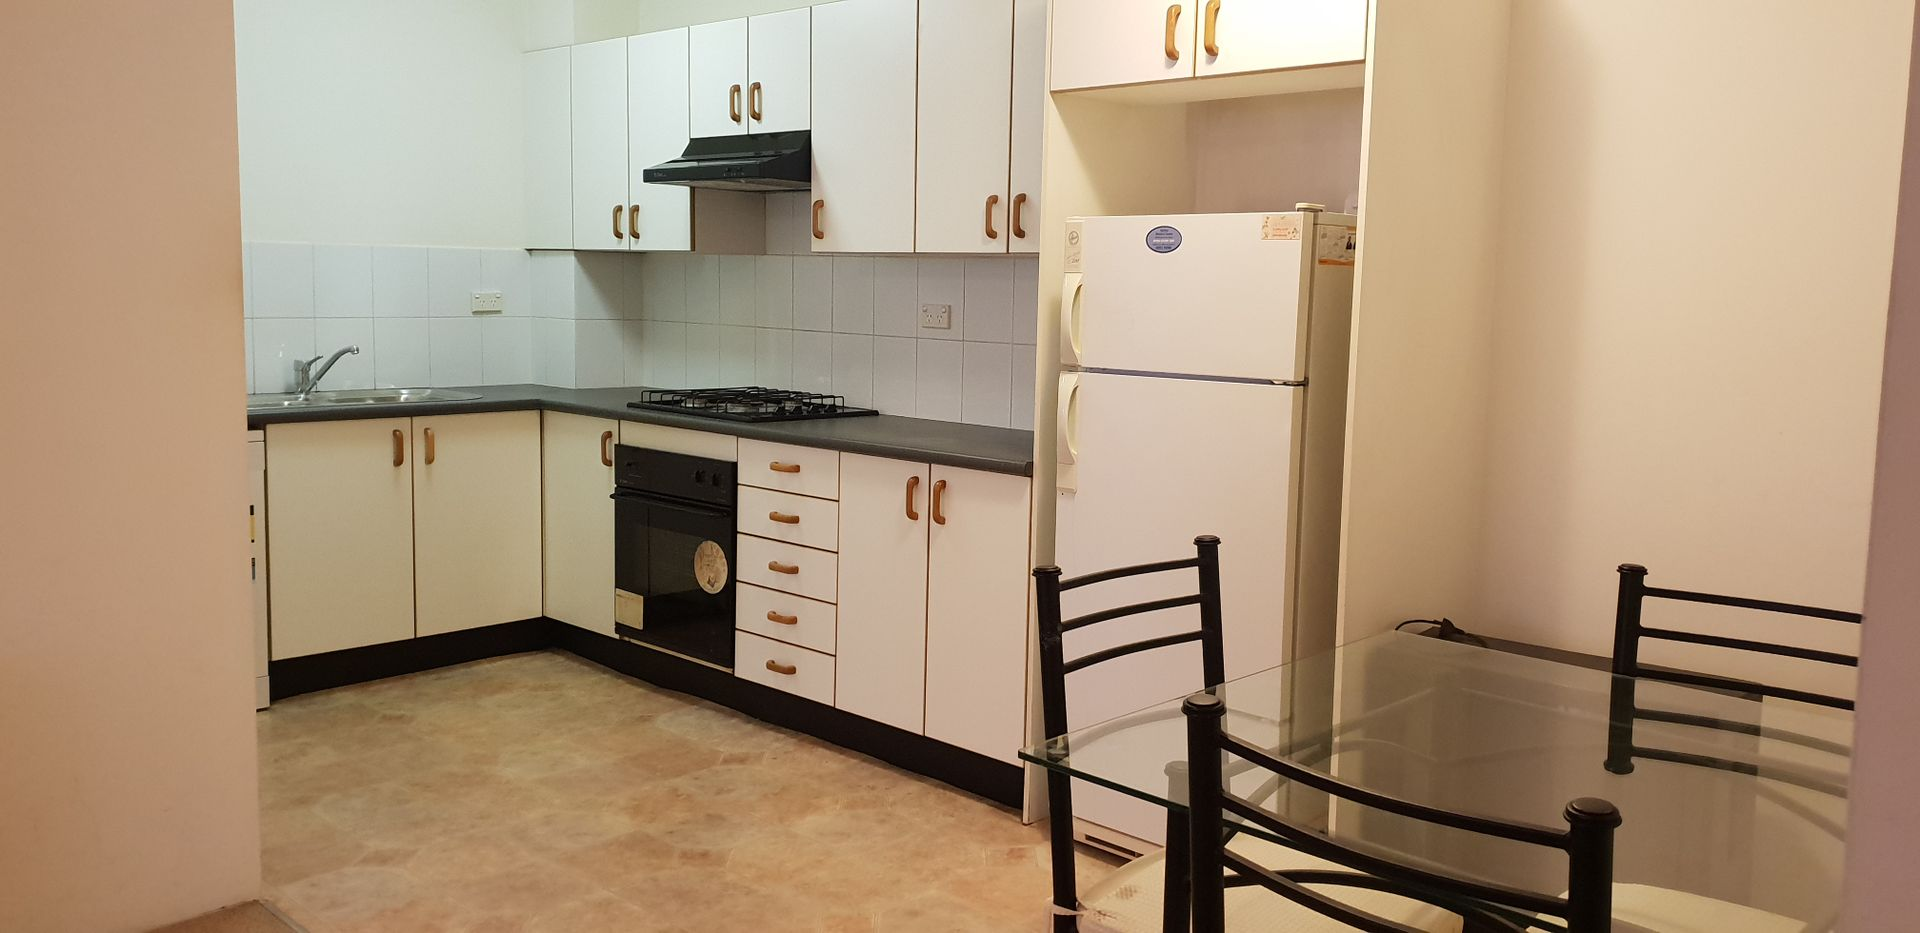 233 Harris St, Pyrmont NSW 2009, Image 2